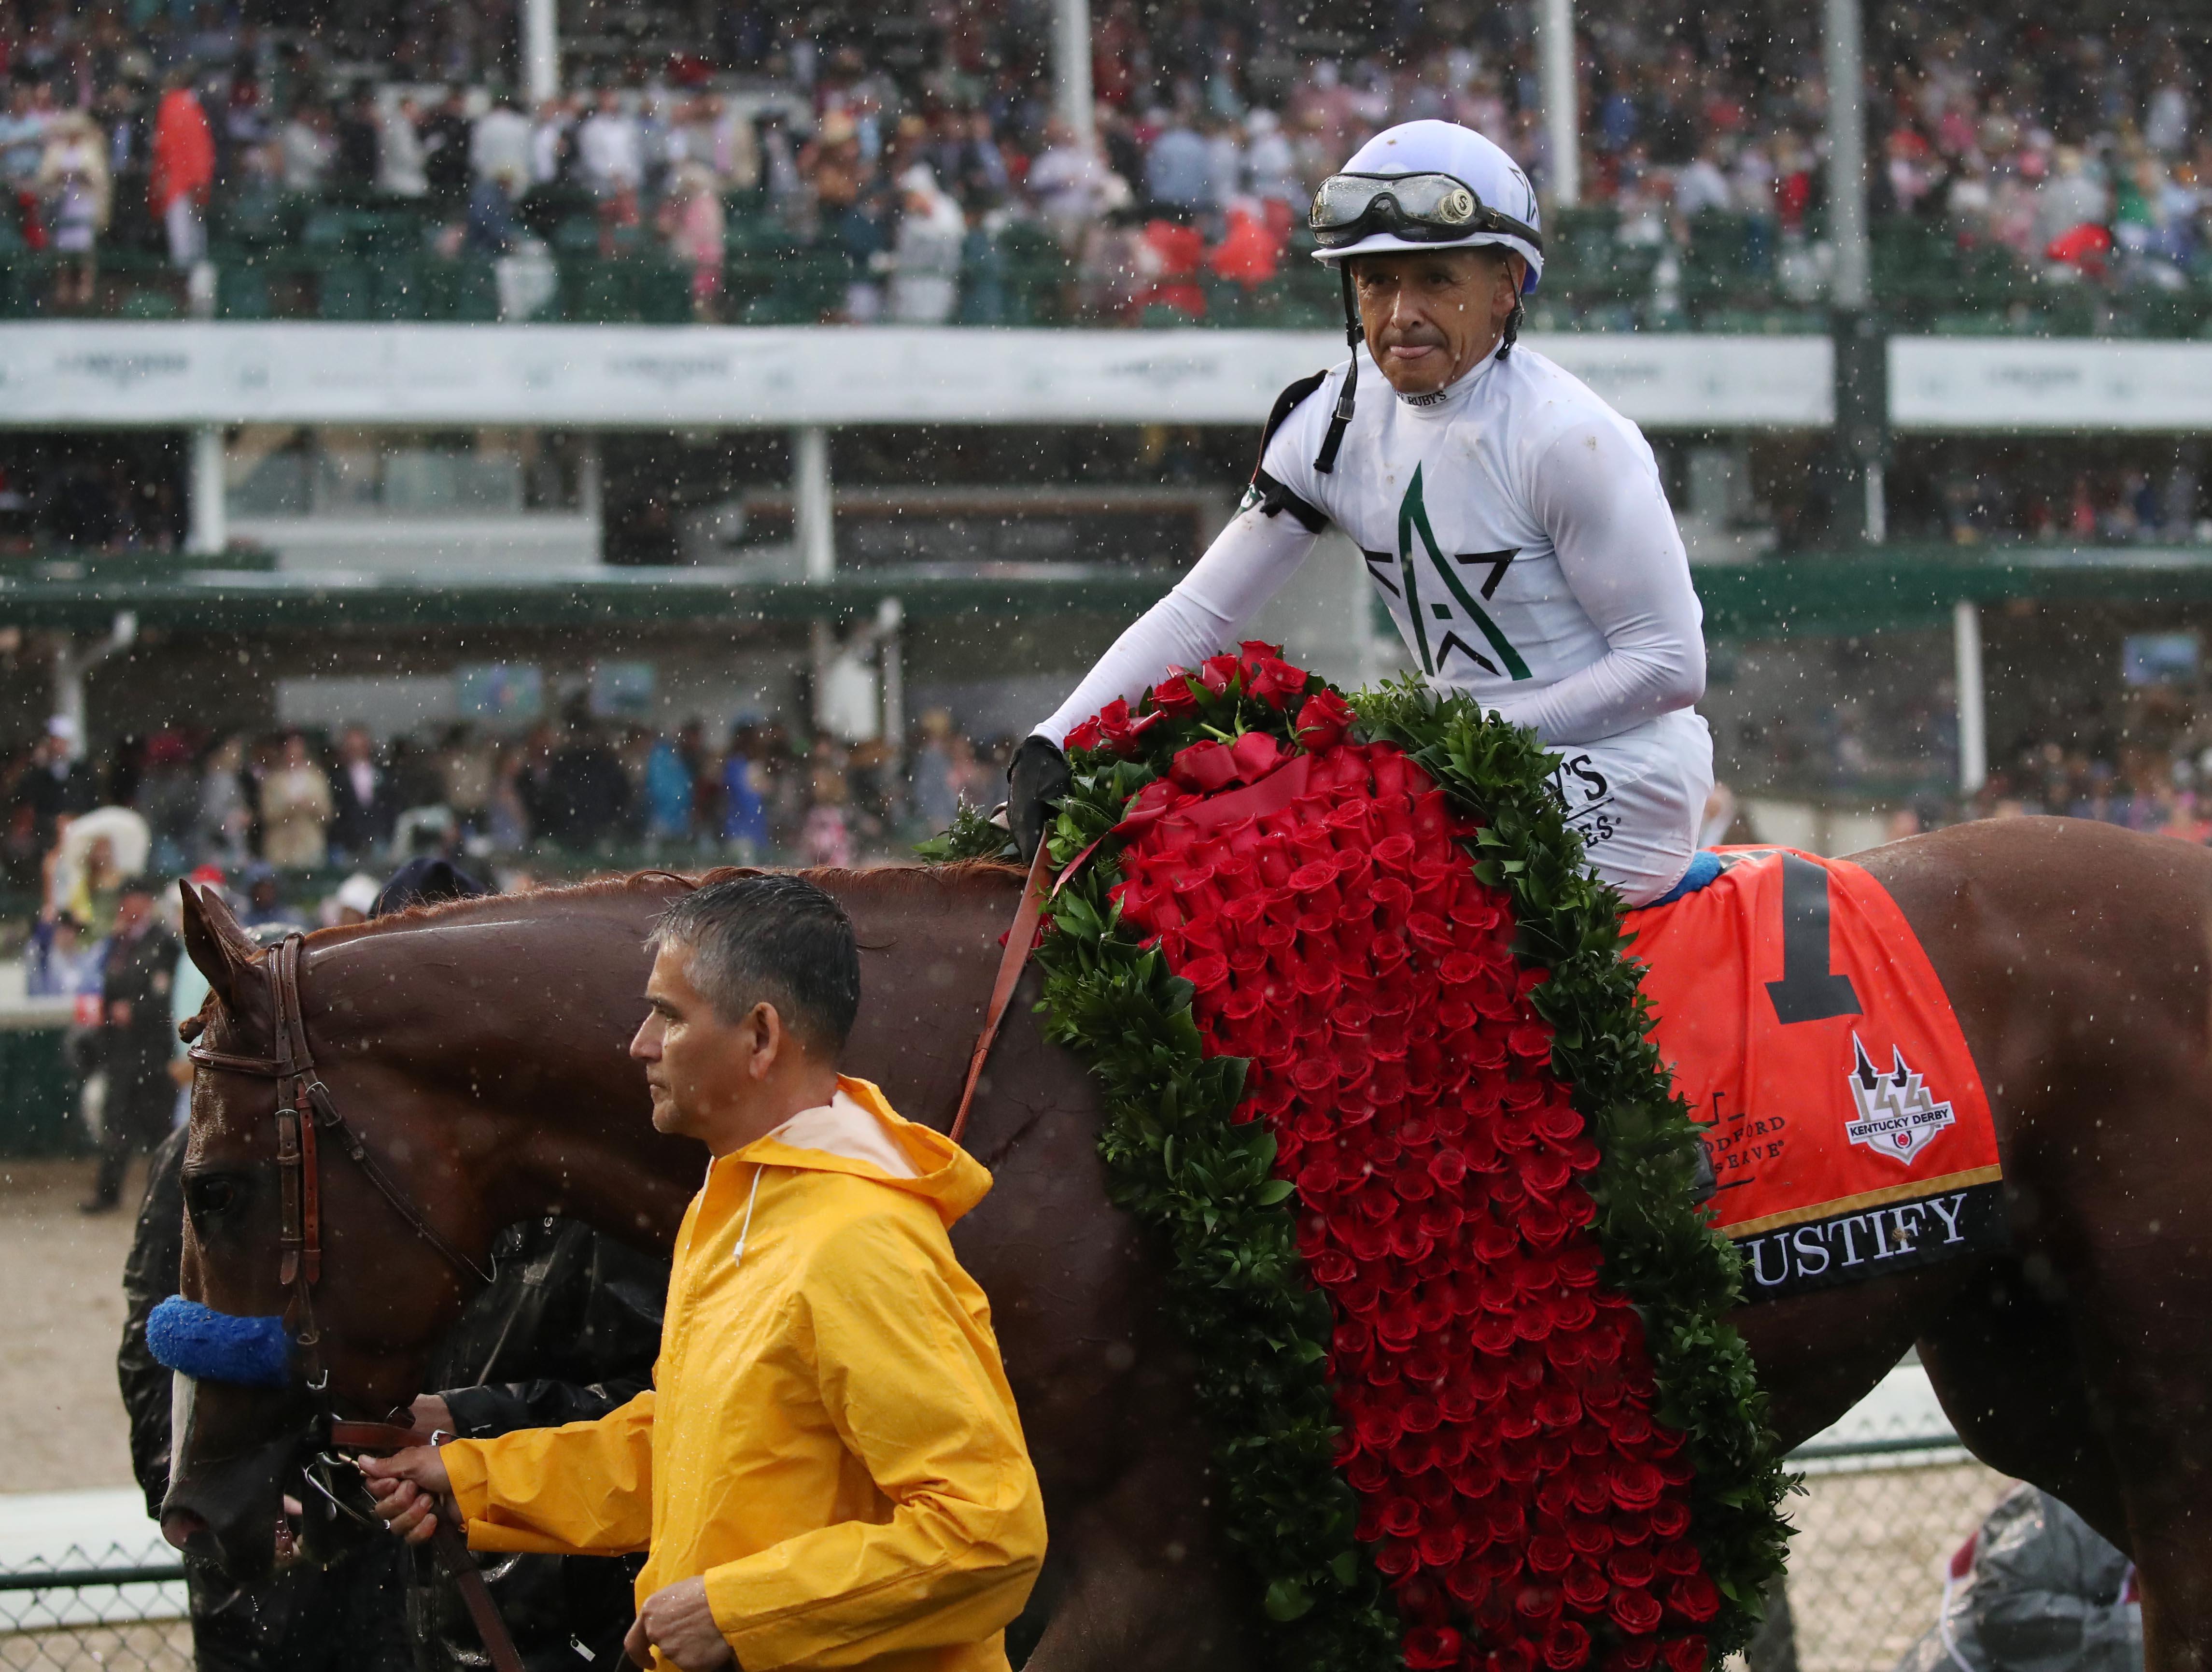 Horse Racing: 144th Kentucky Derby